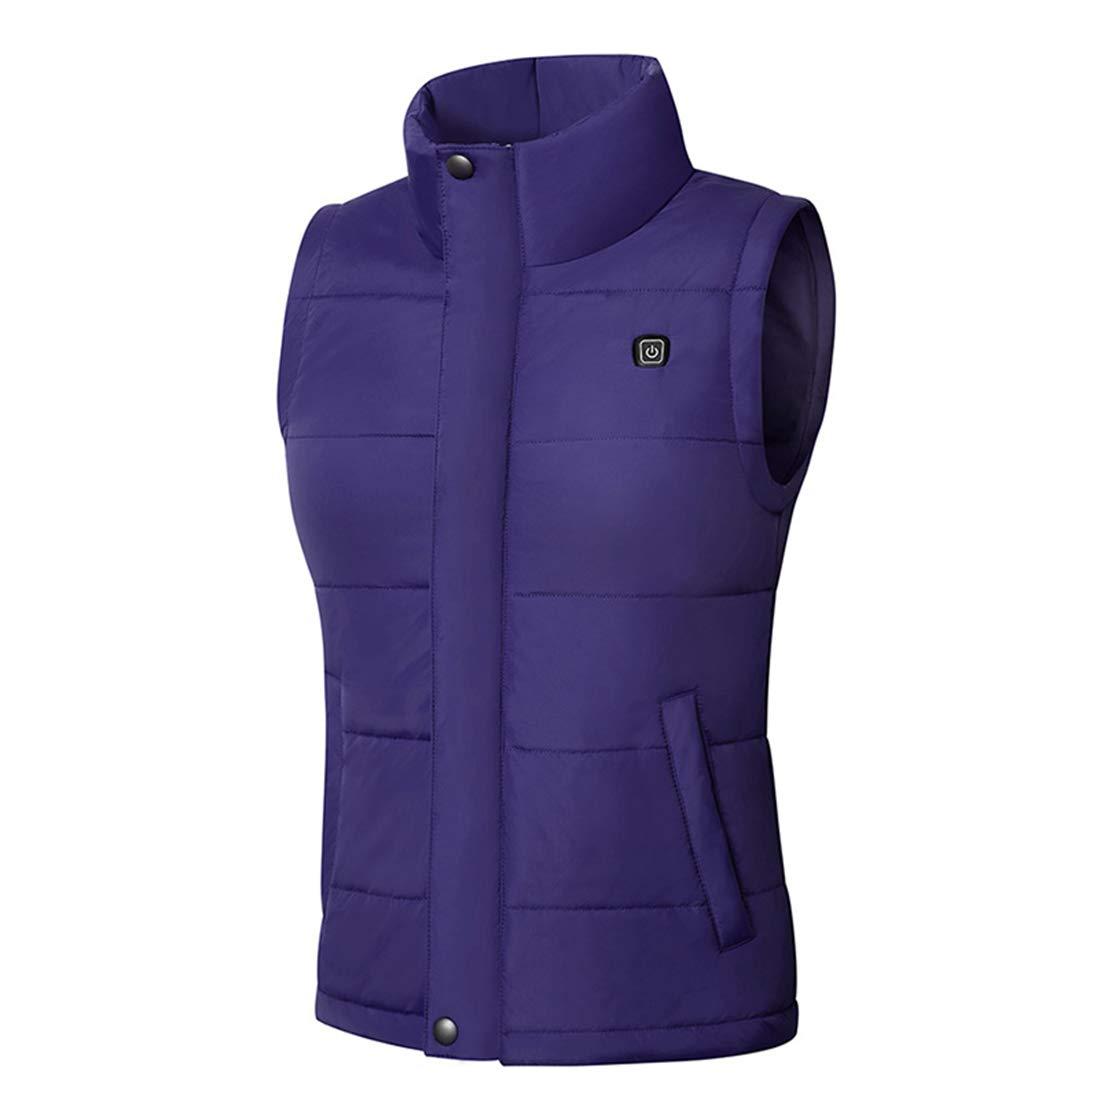 Winter Waistcoat Unisex Washable KIND NY Electric Heated Vest Warmer Jacket V-neck//High Collar